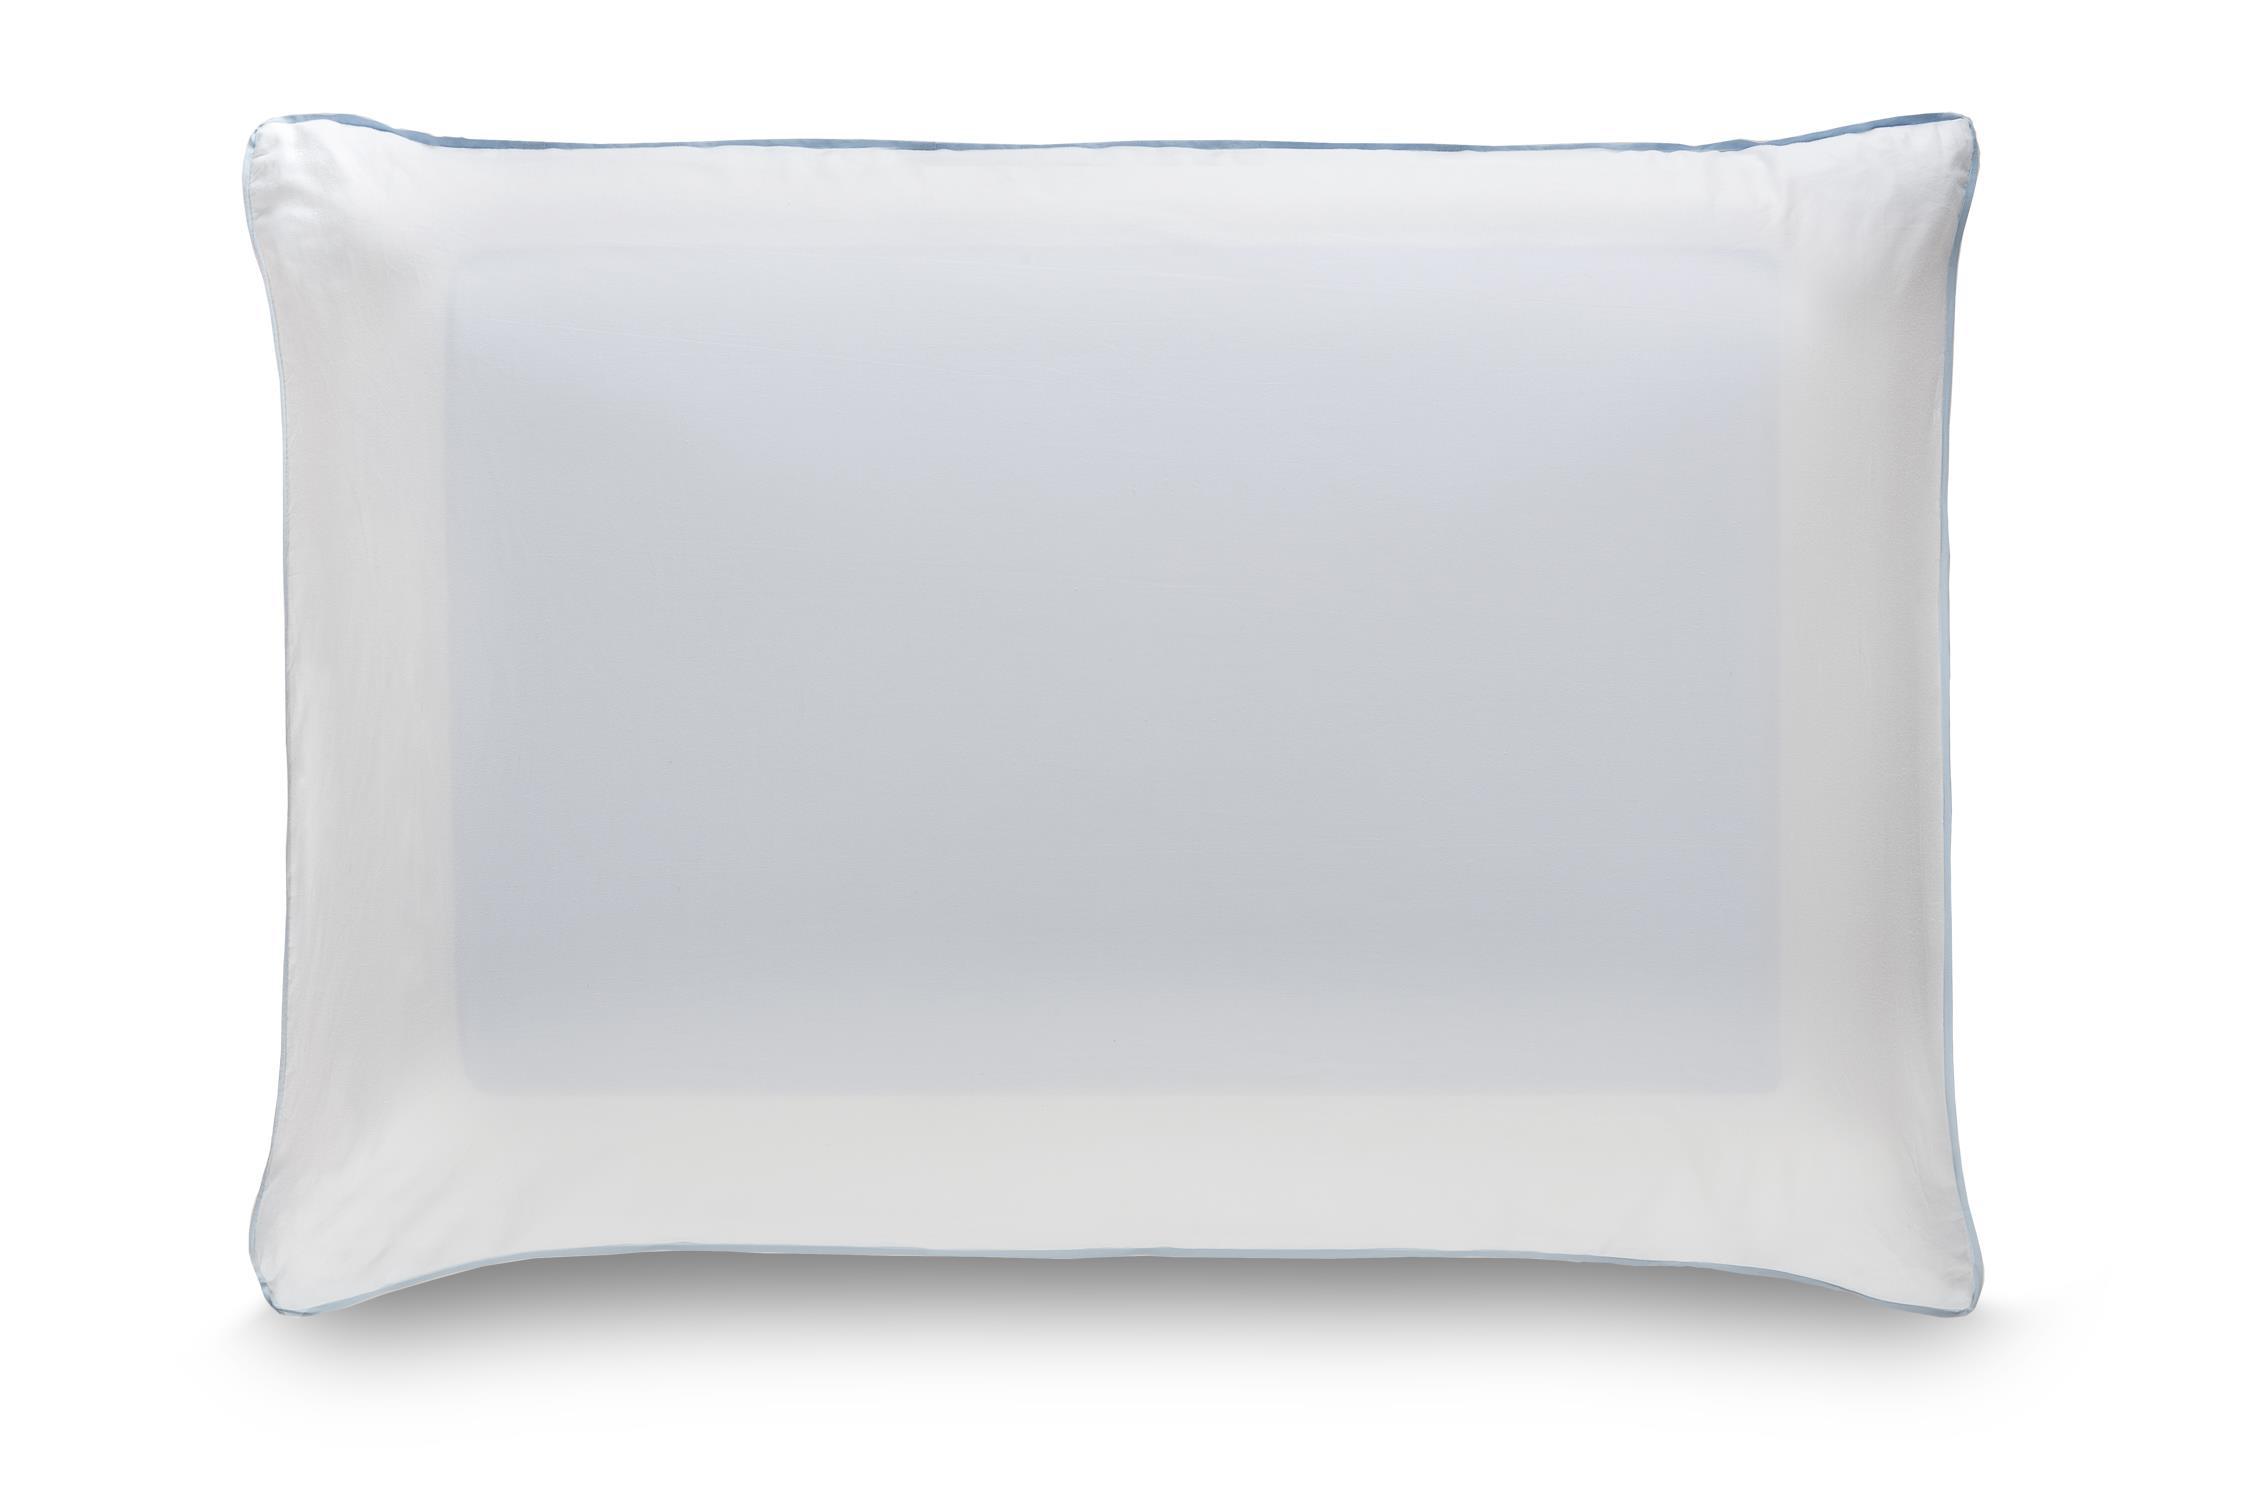 Tempur-Pedic® Pillows Queen Cloud Breeze Pillow - Item Number: 15440321